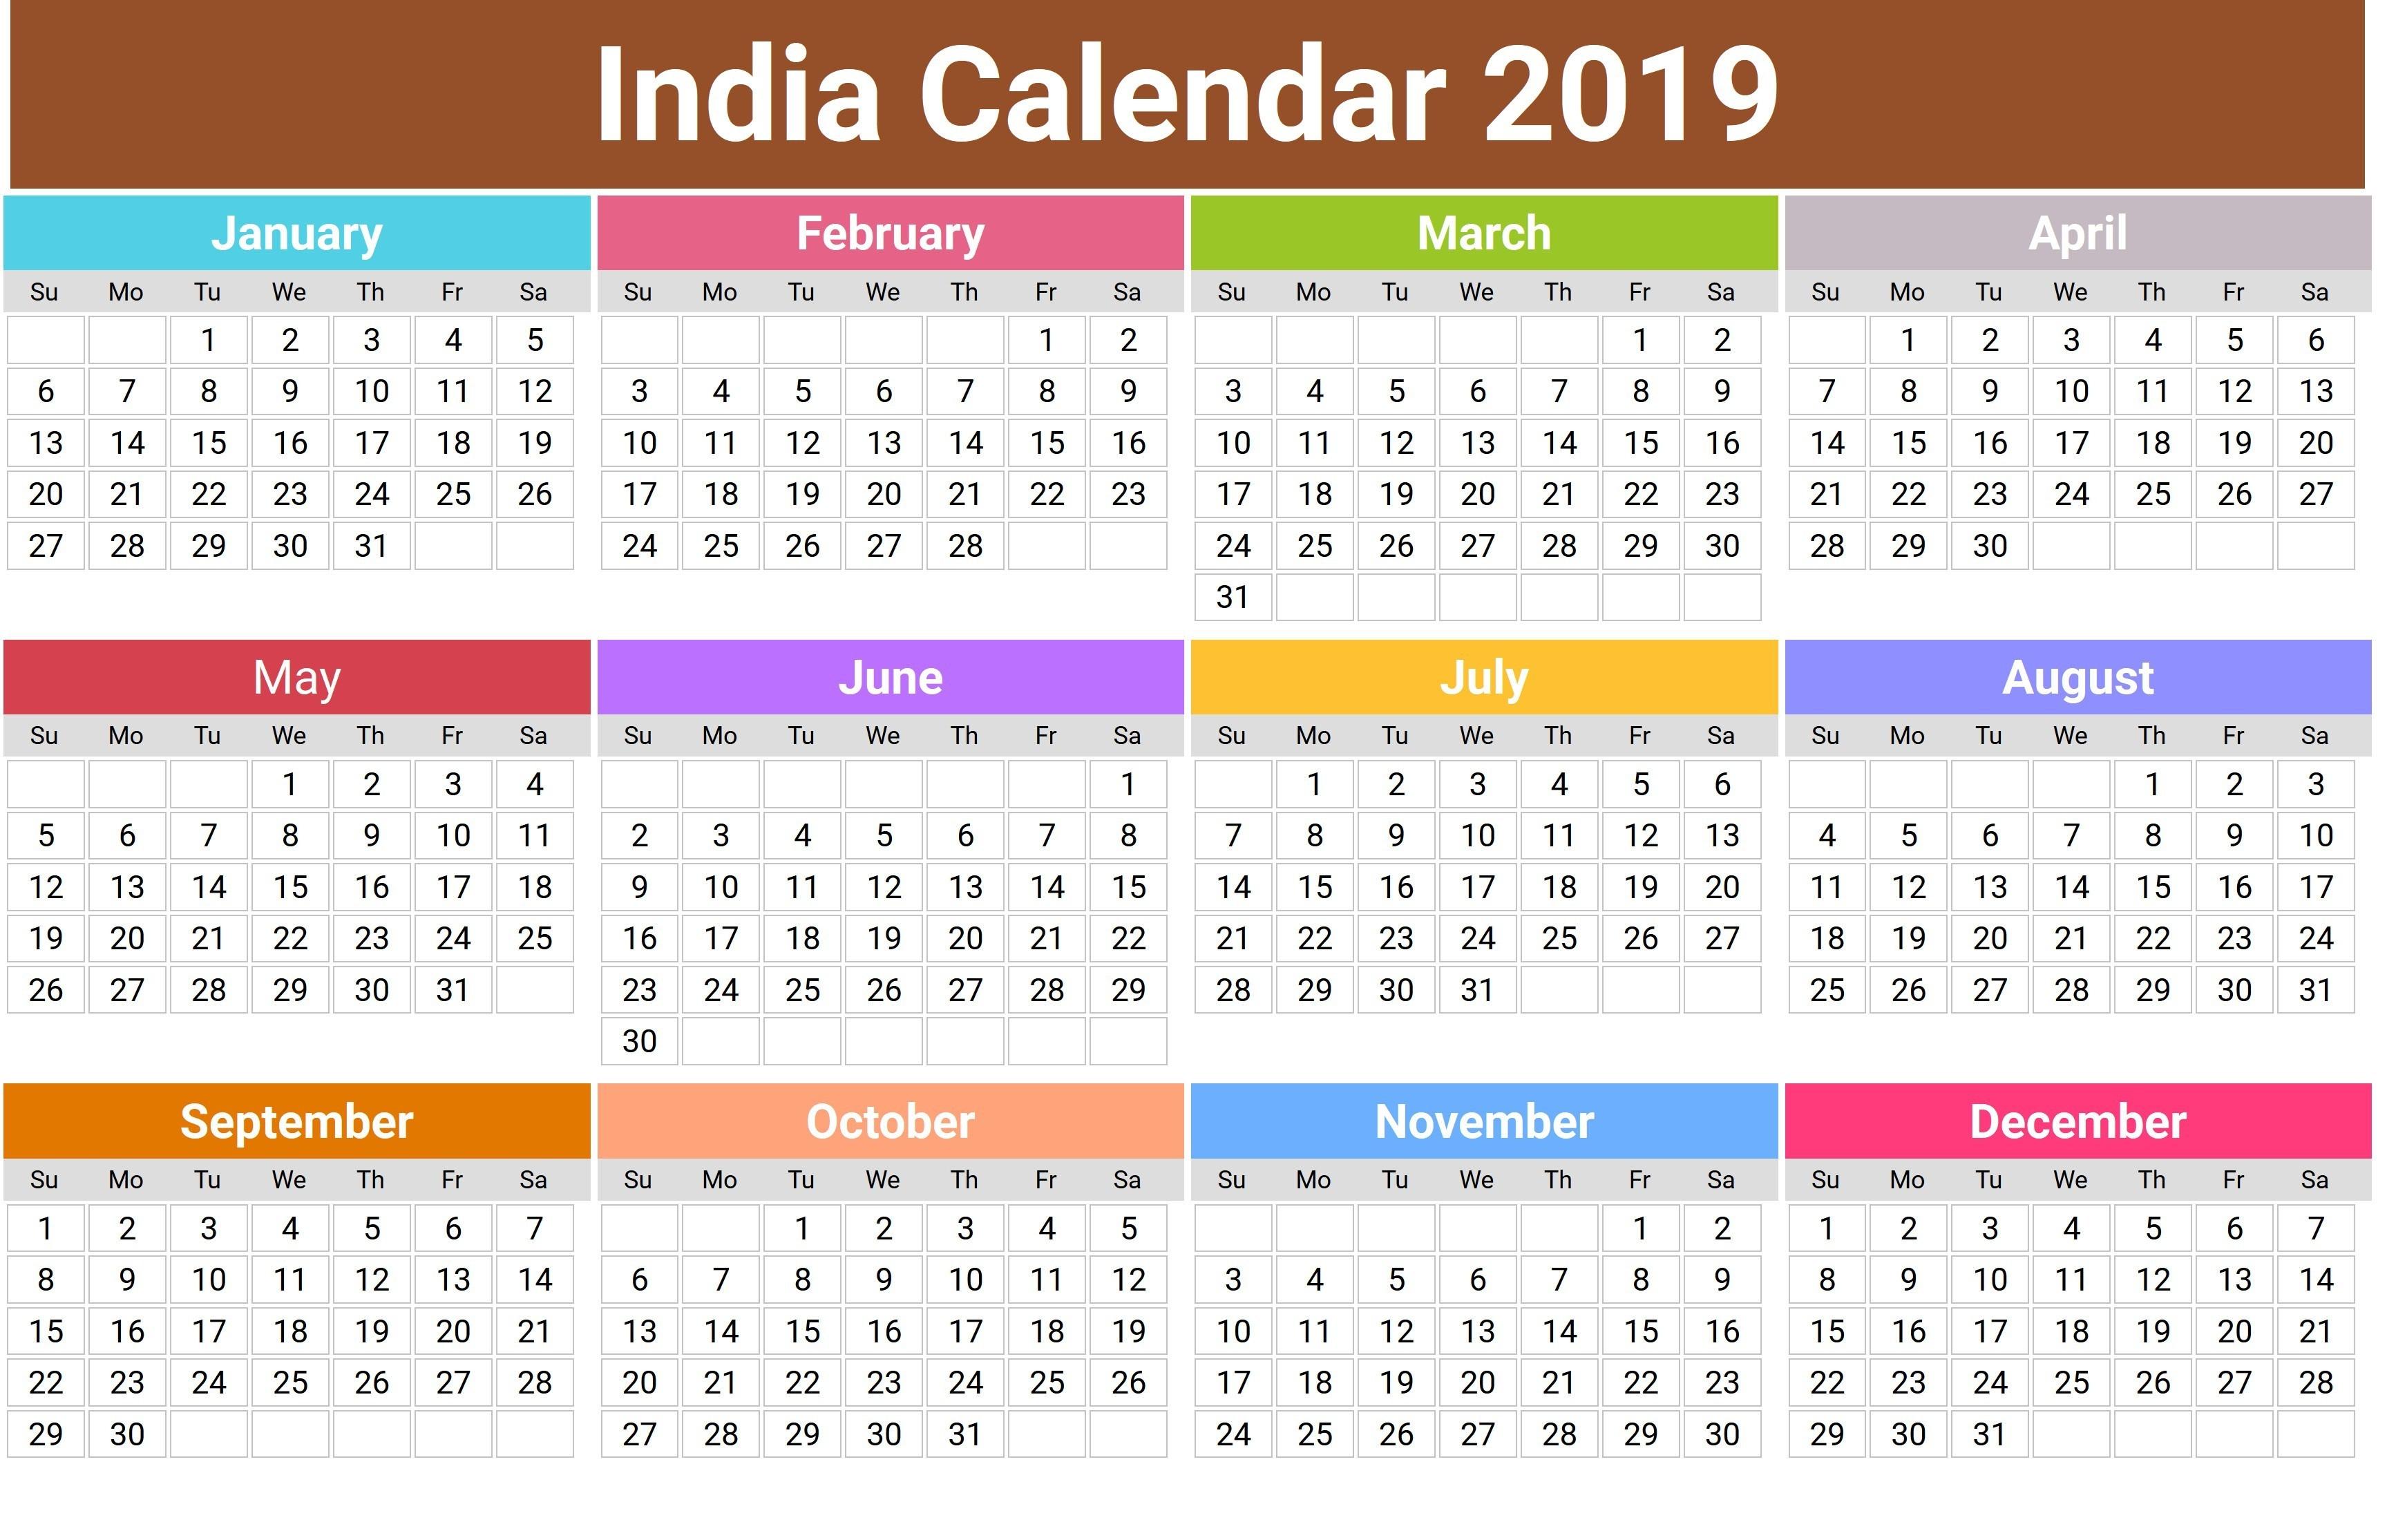 2019 Hindu Calendar With Tithi | Tyohar, Holidays, Festivals-Calendar 2020 Holidays Hindi